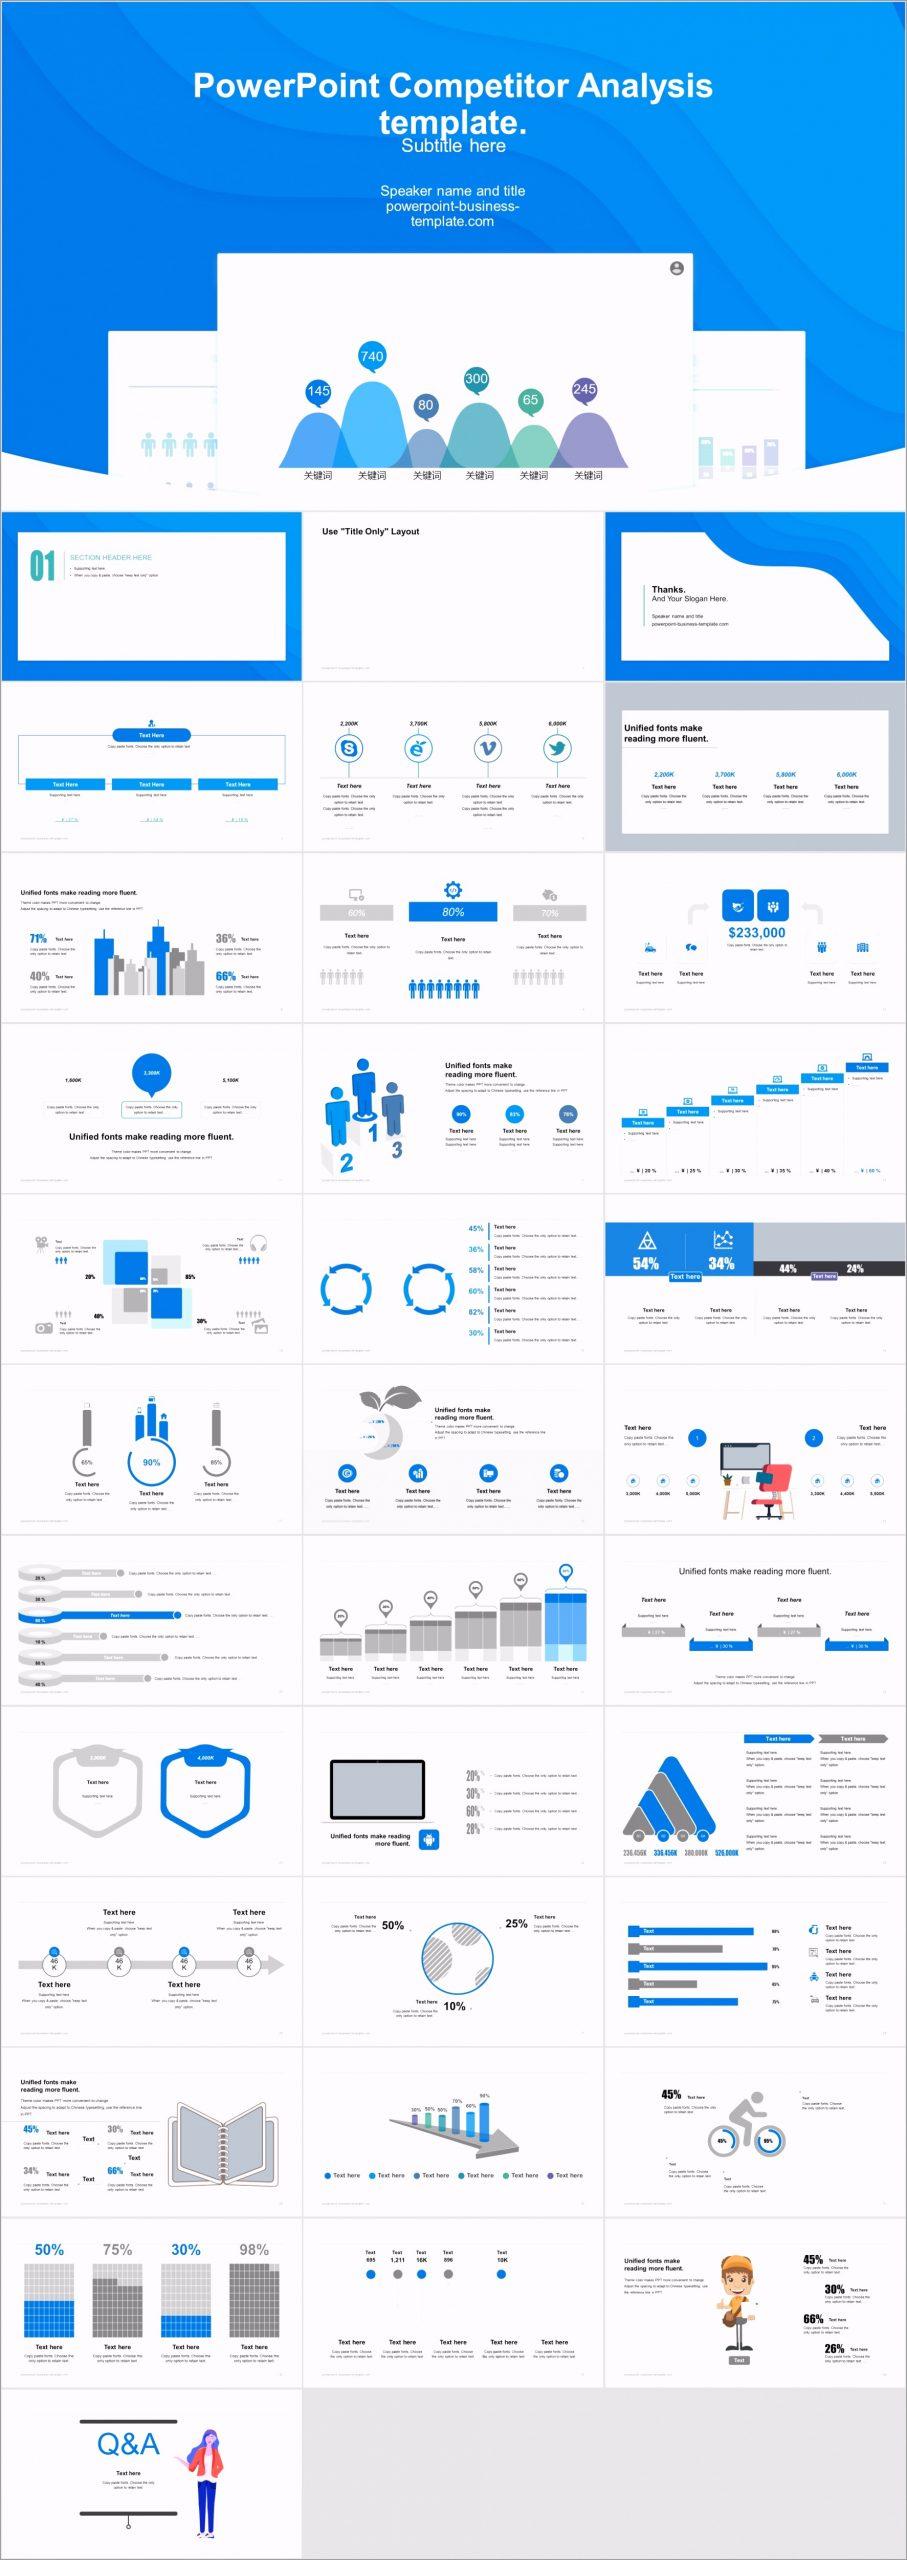 PowerPoint petitor Analysis template irupi